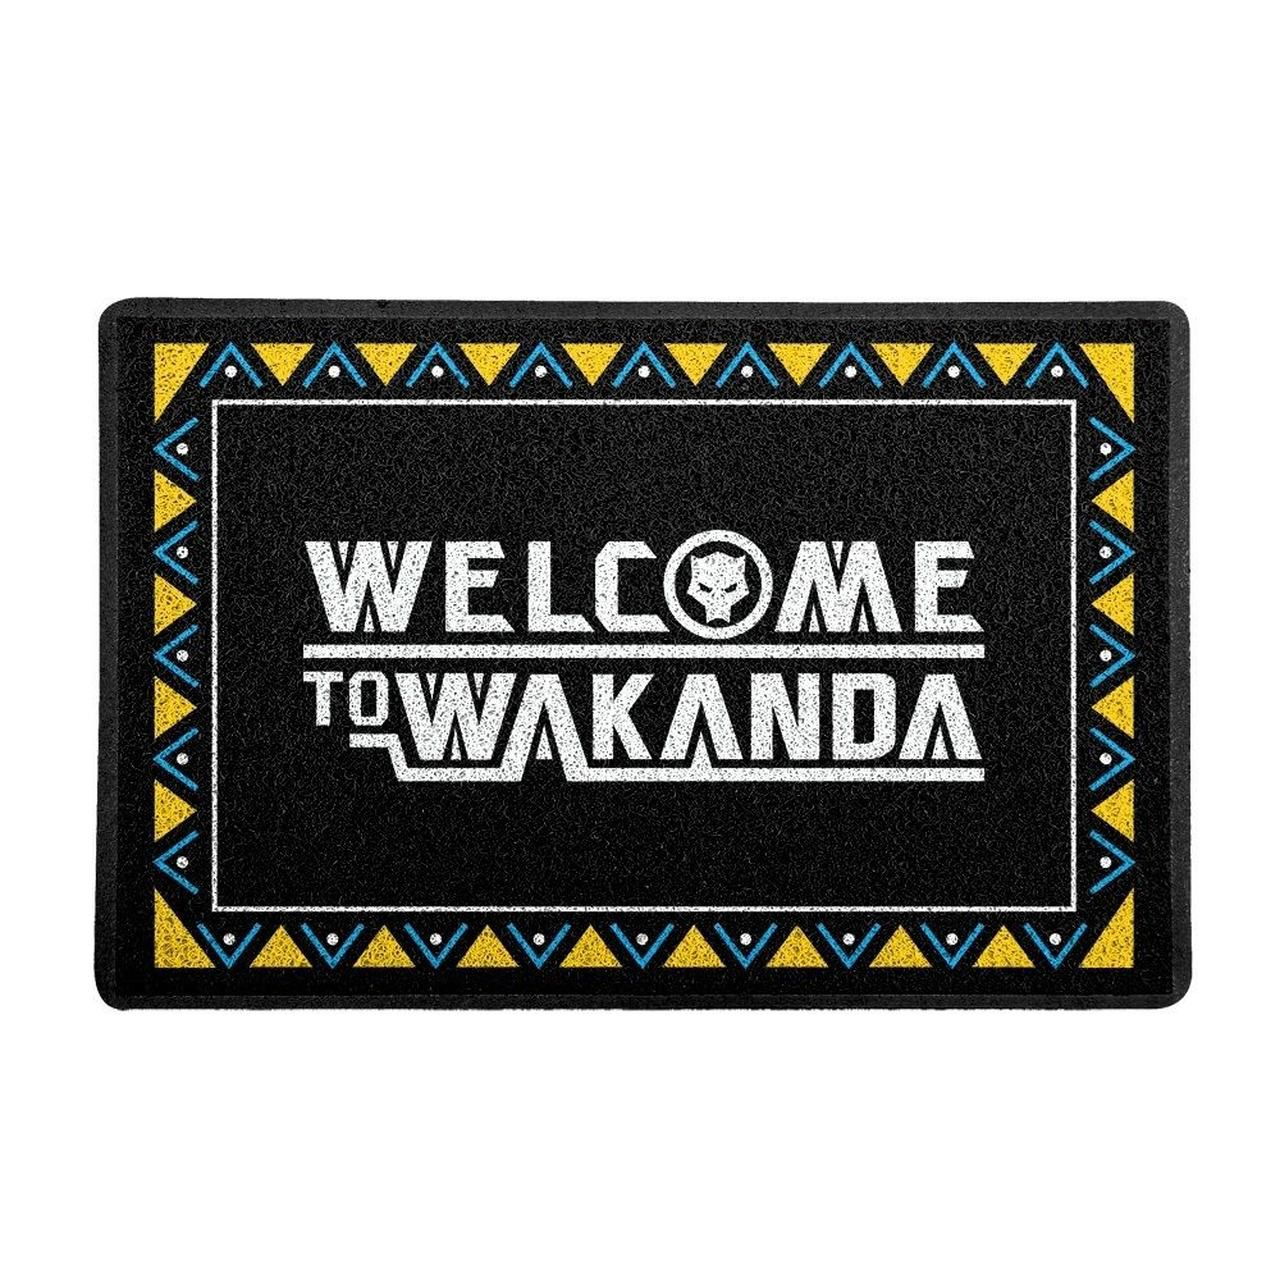 Capacho Welcome to Wakanda 60x40 cm